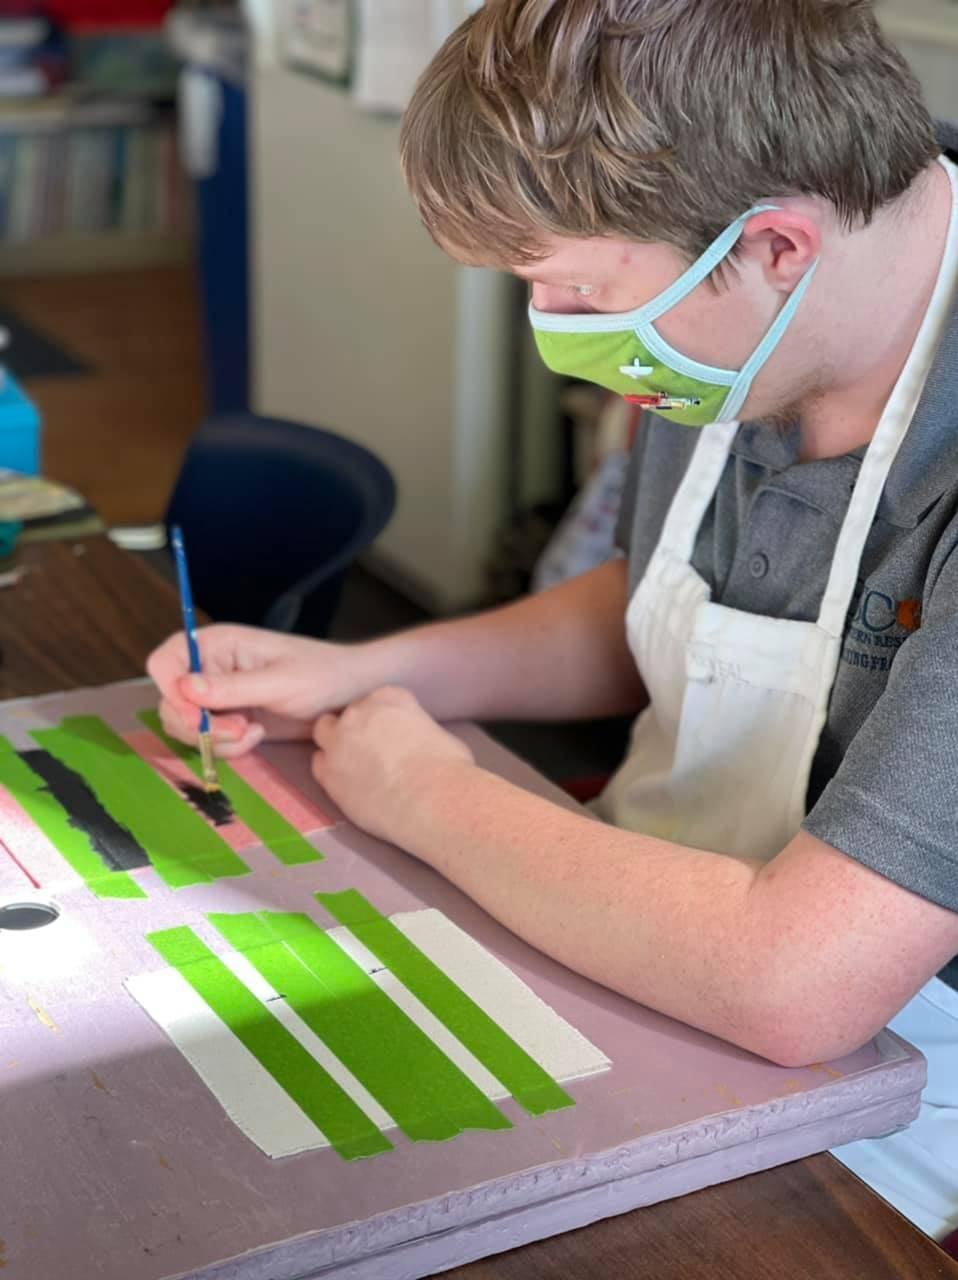 Student working on making a tic tac toe set